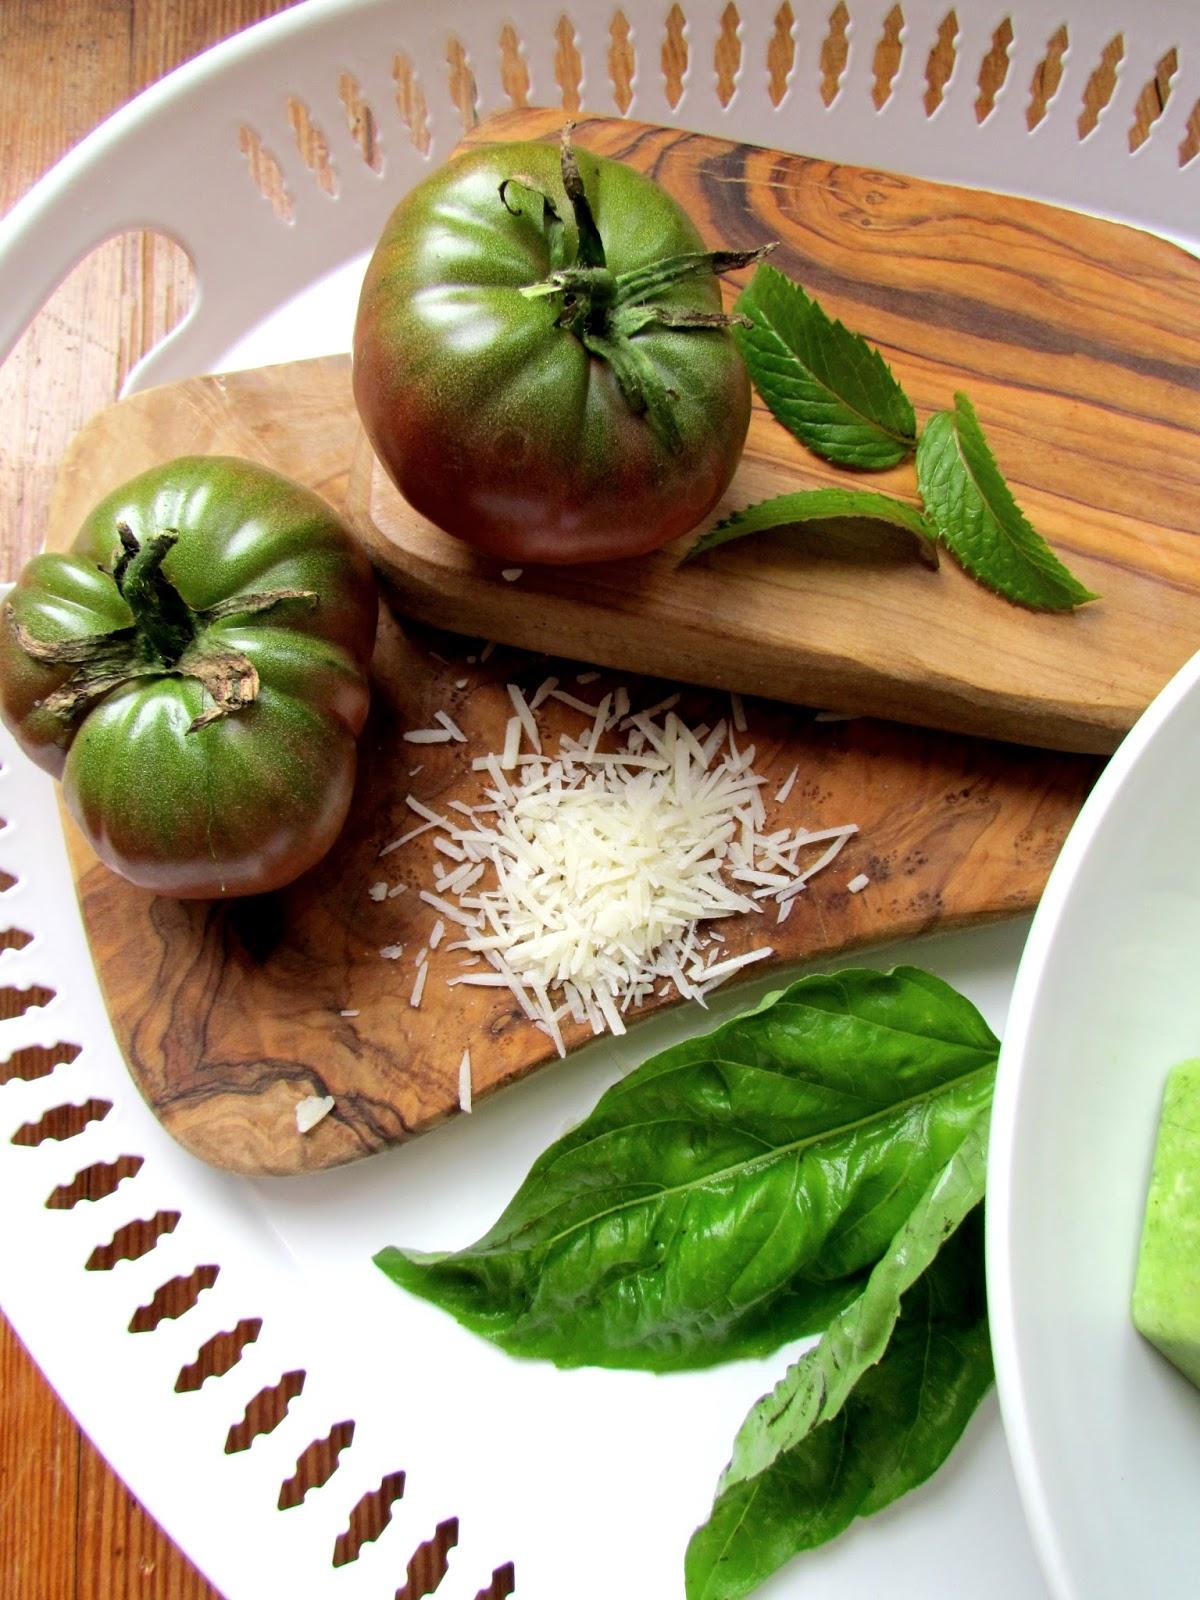 Trisha Brink Design: Green Tomato Pesto - My Hubby's Specialty